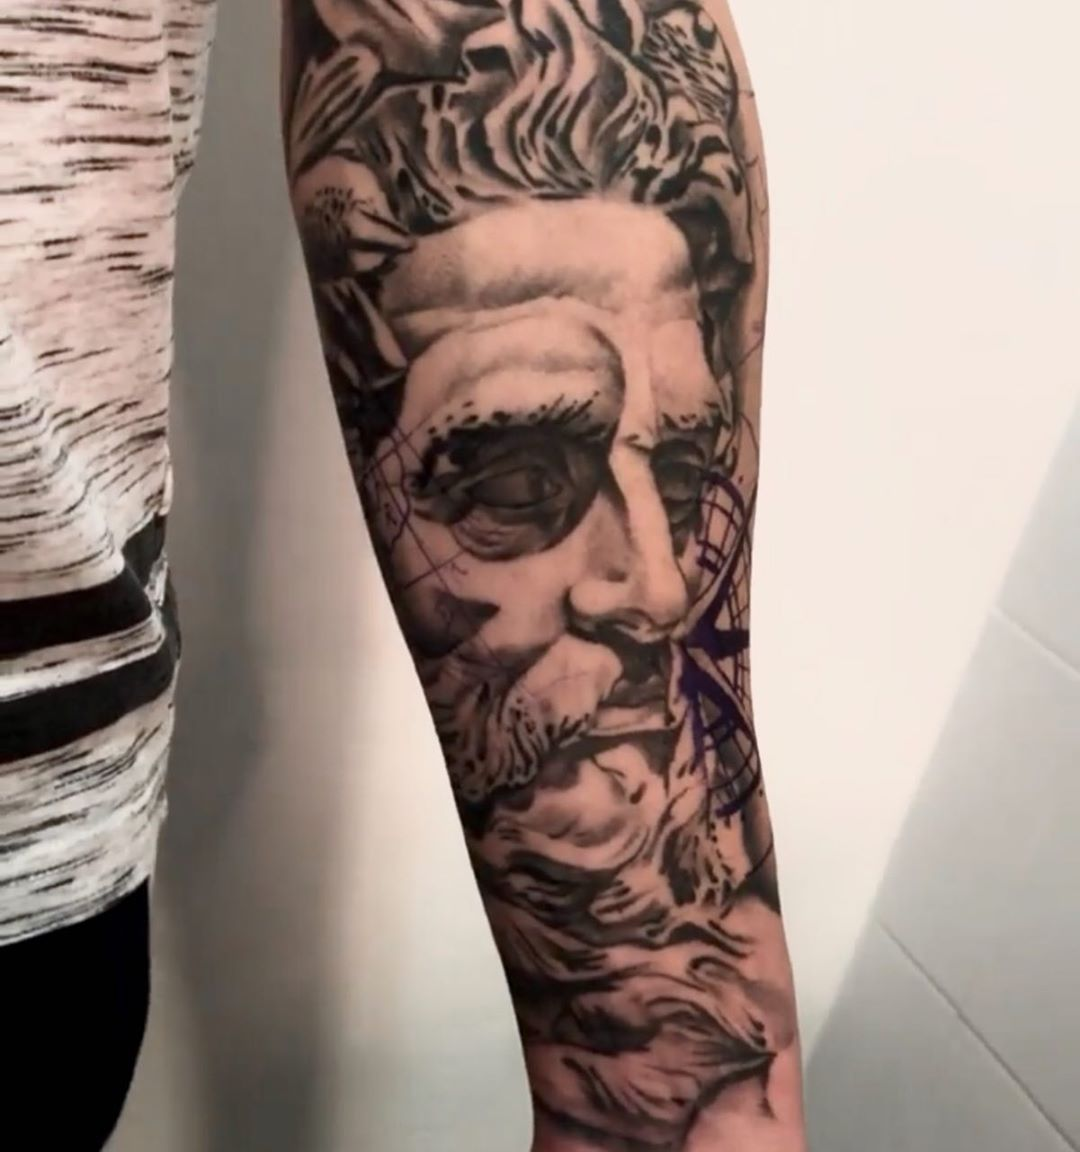 ink,inked,inkedmag,thebesttattooartist,miami,miamiink,oceandrivemiami,eeuu,spain,madrid,thebesttattooartists,follow,followme,followforfollw,americantattoos,realismotattoo,poseidon,tattoo,tattoostuff,tattoogirl